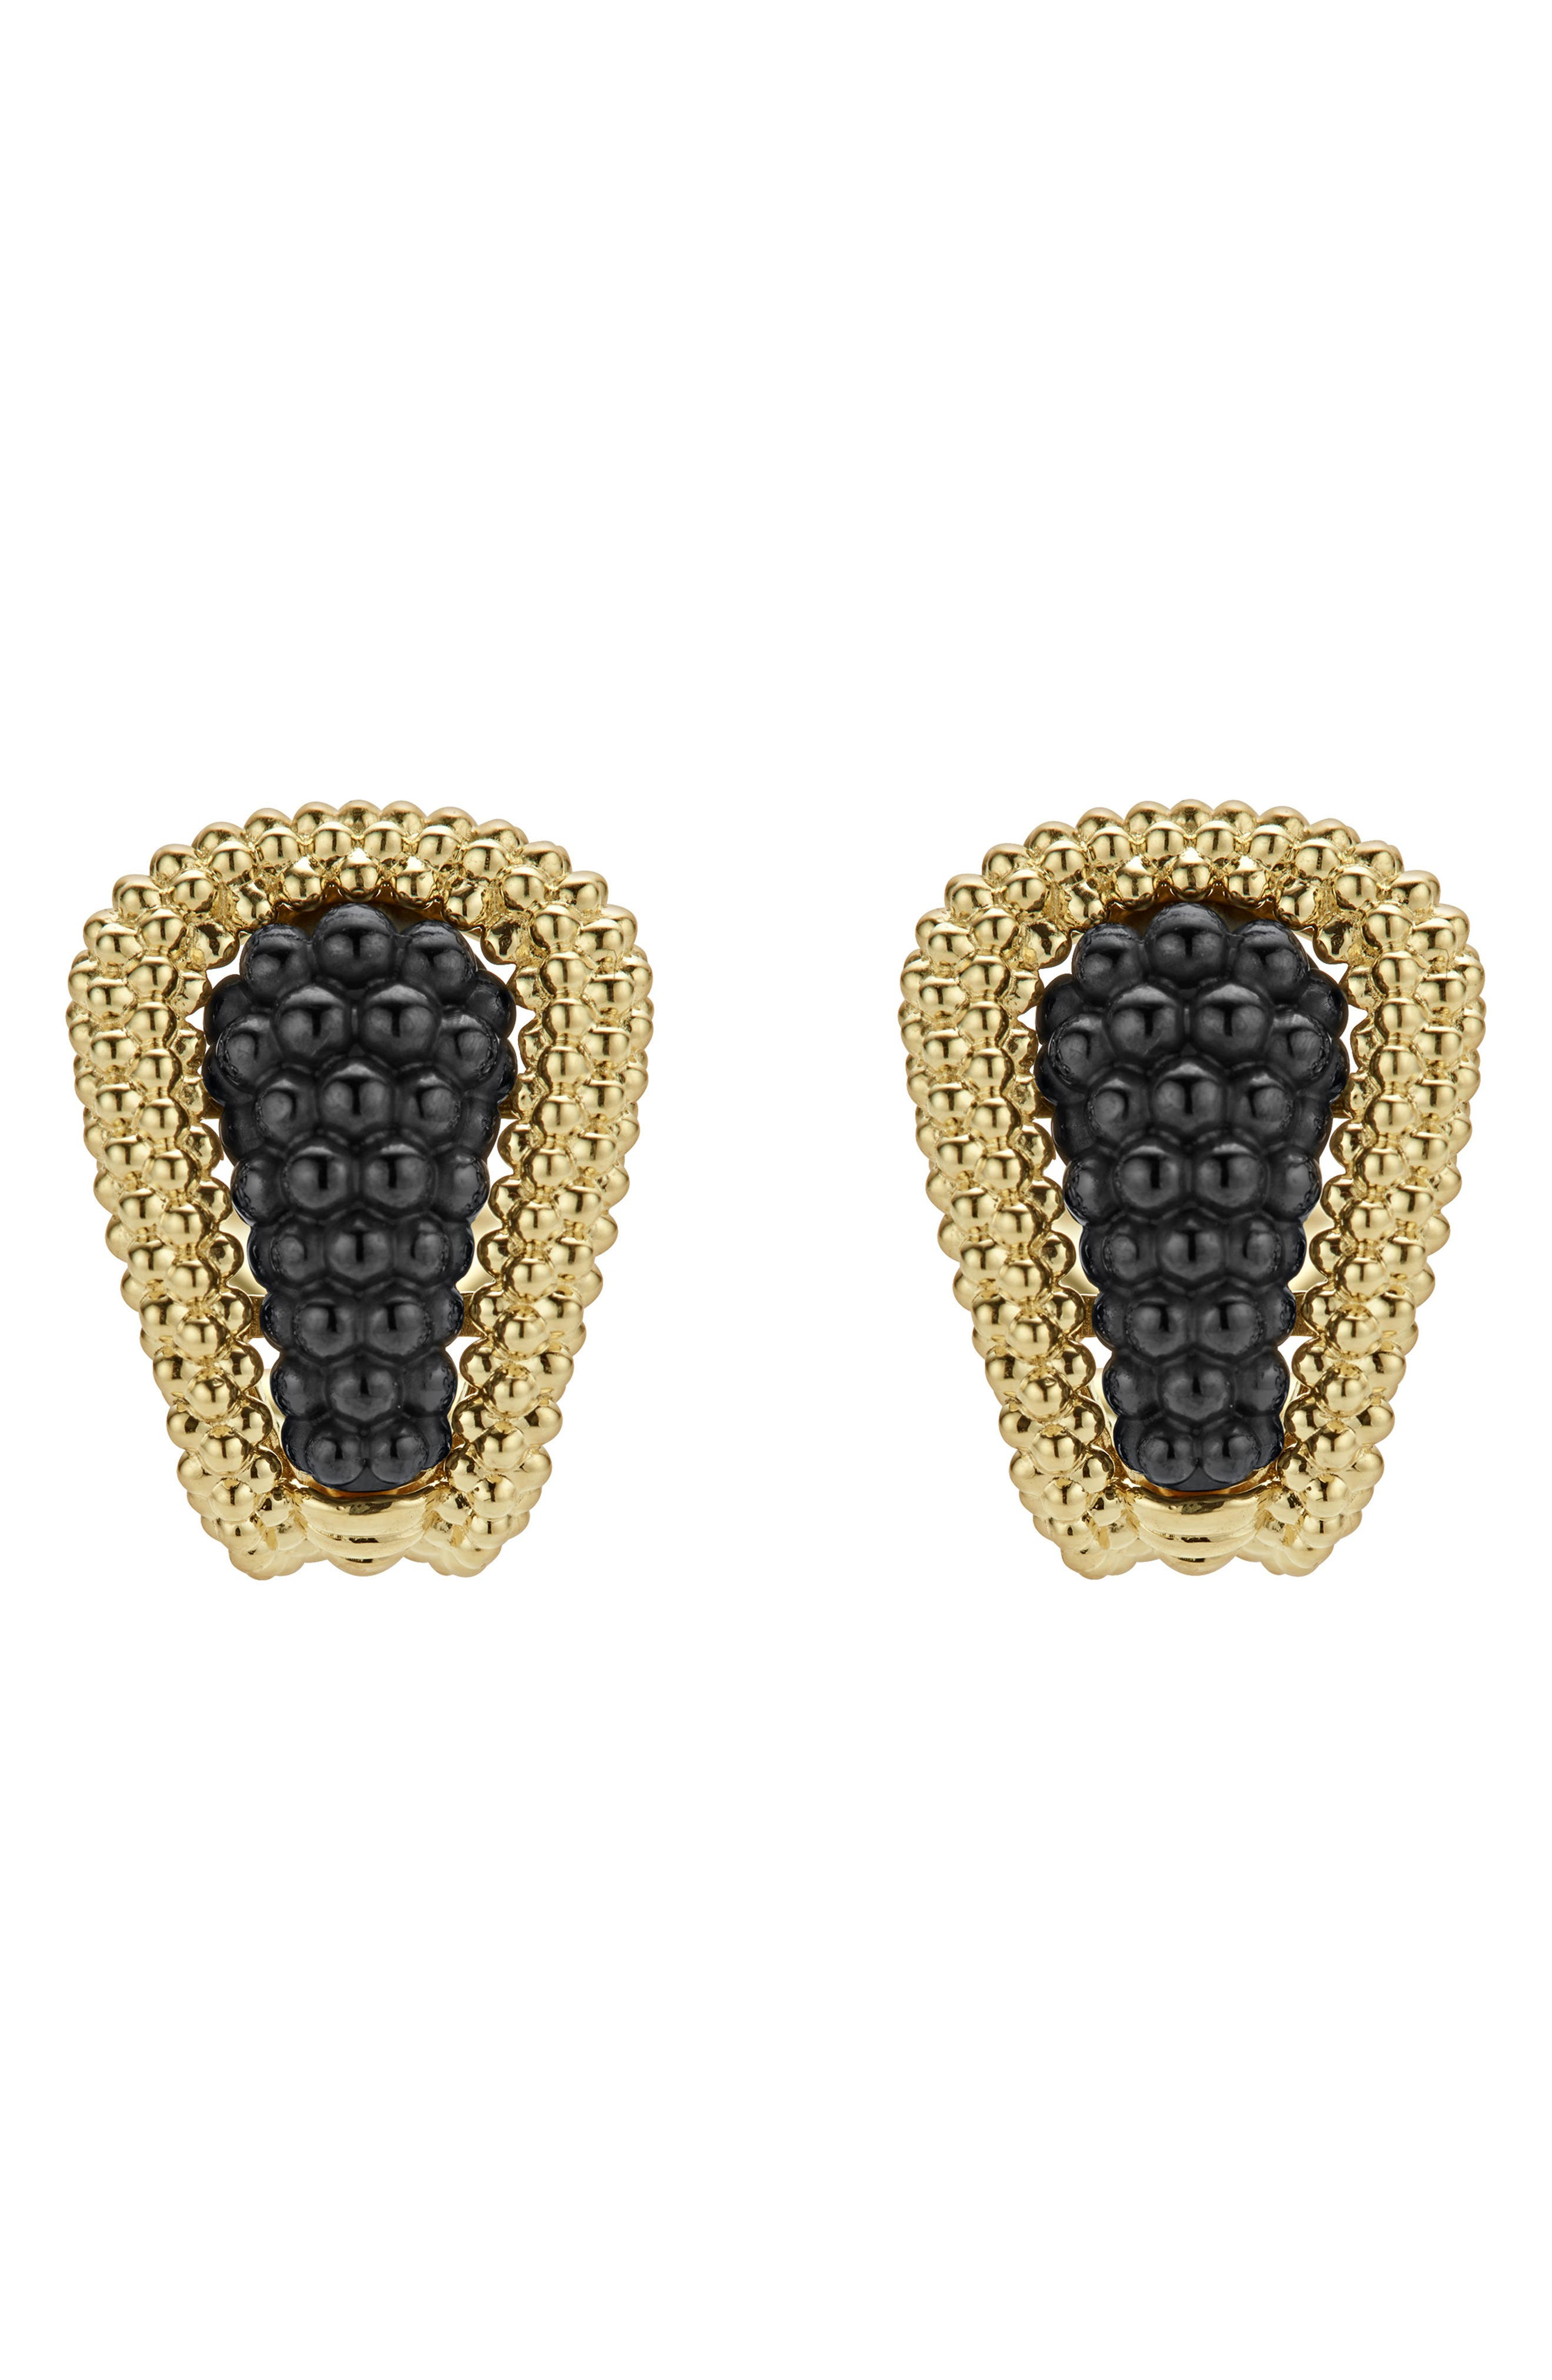 Gold & Black Caviar Tapered Omega Earrings,                             Alternate thumbnail 3, color,                             GOLD